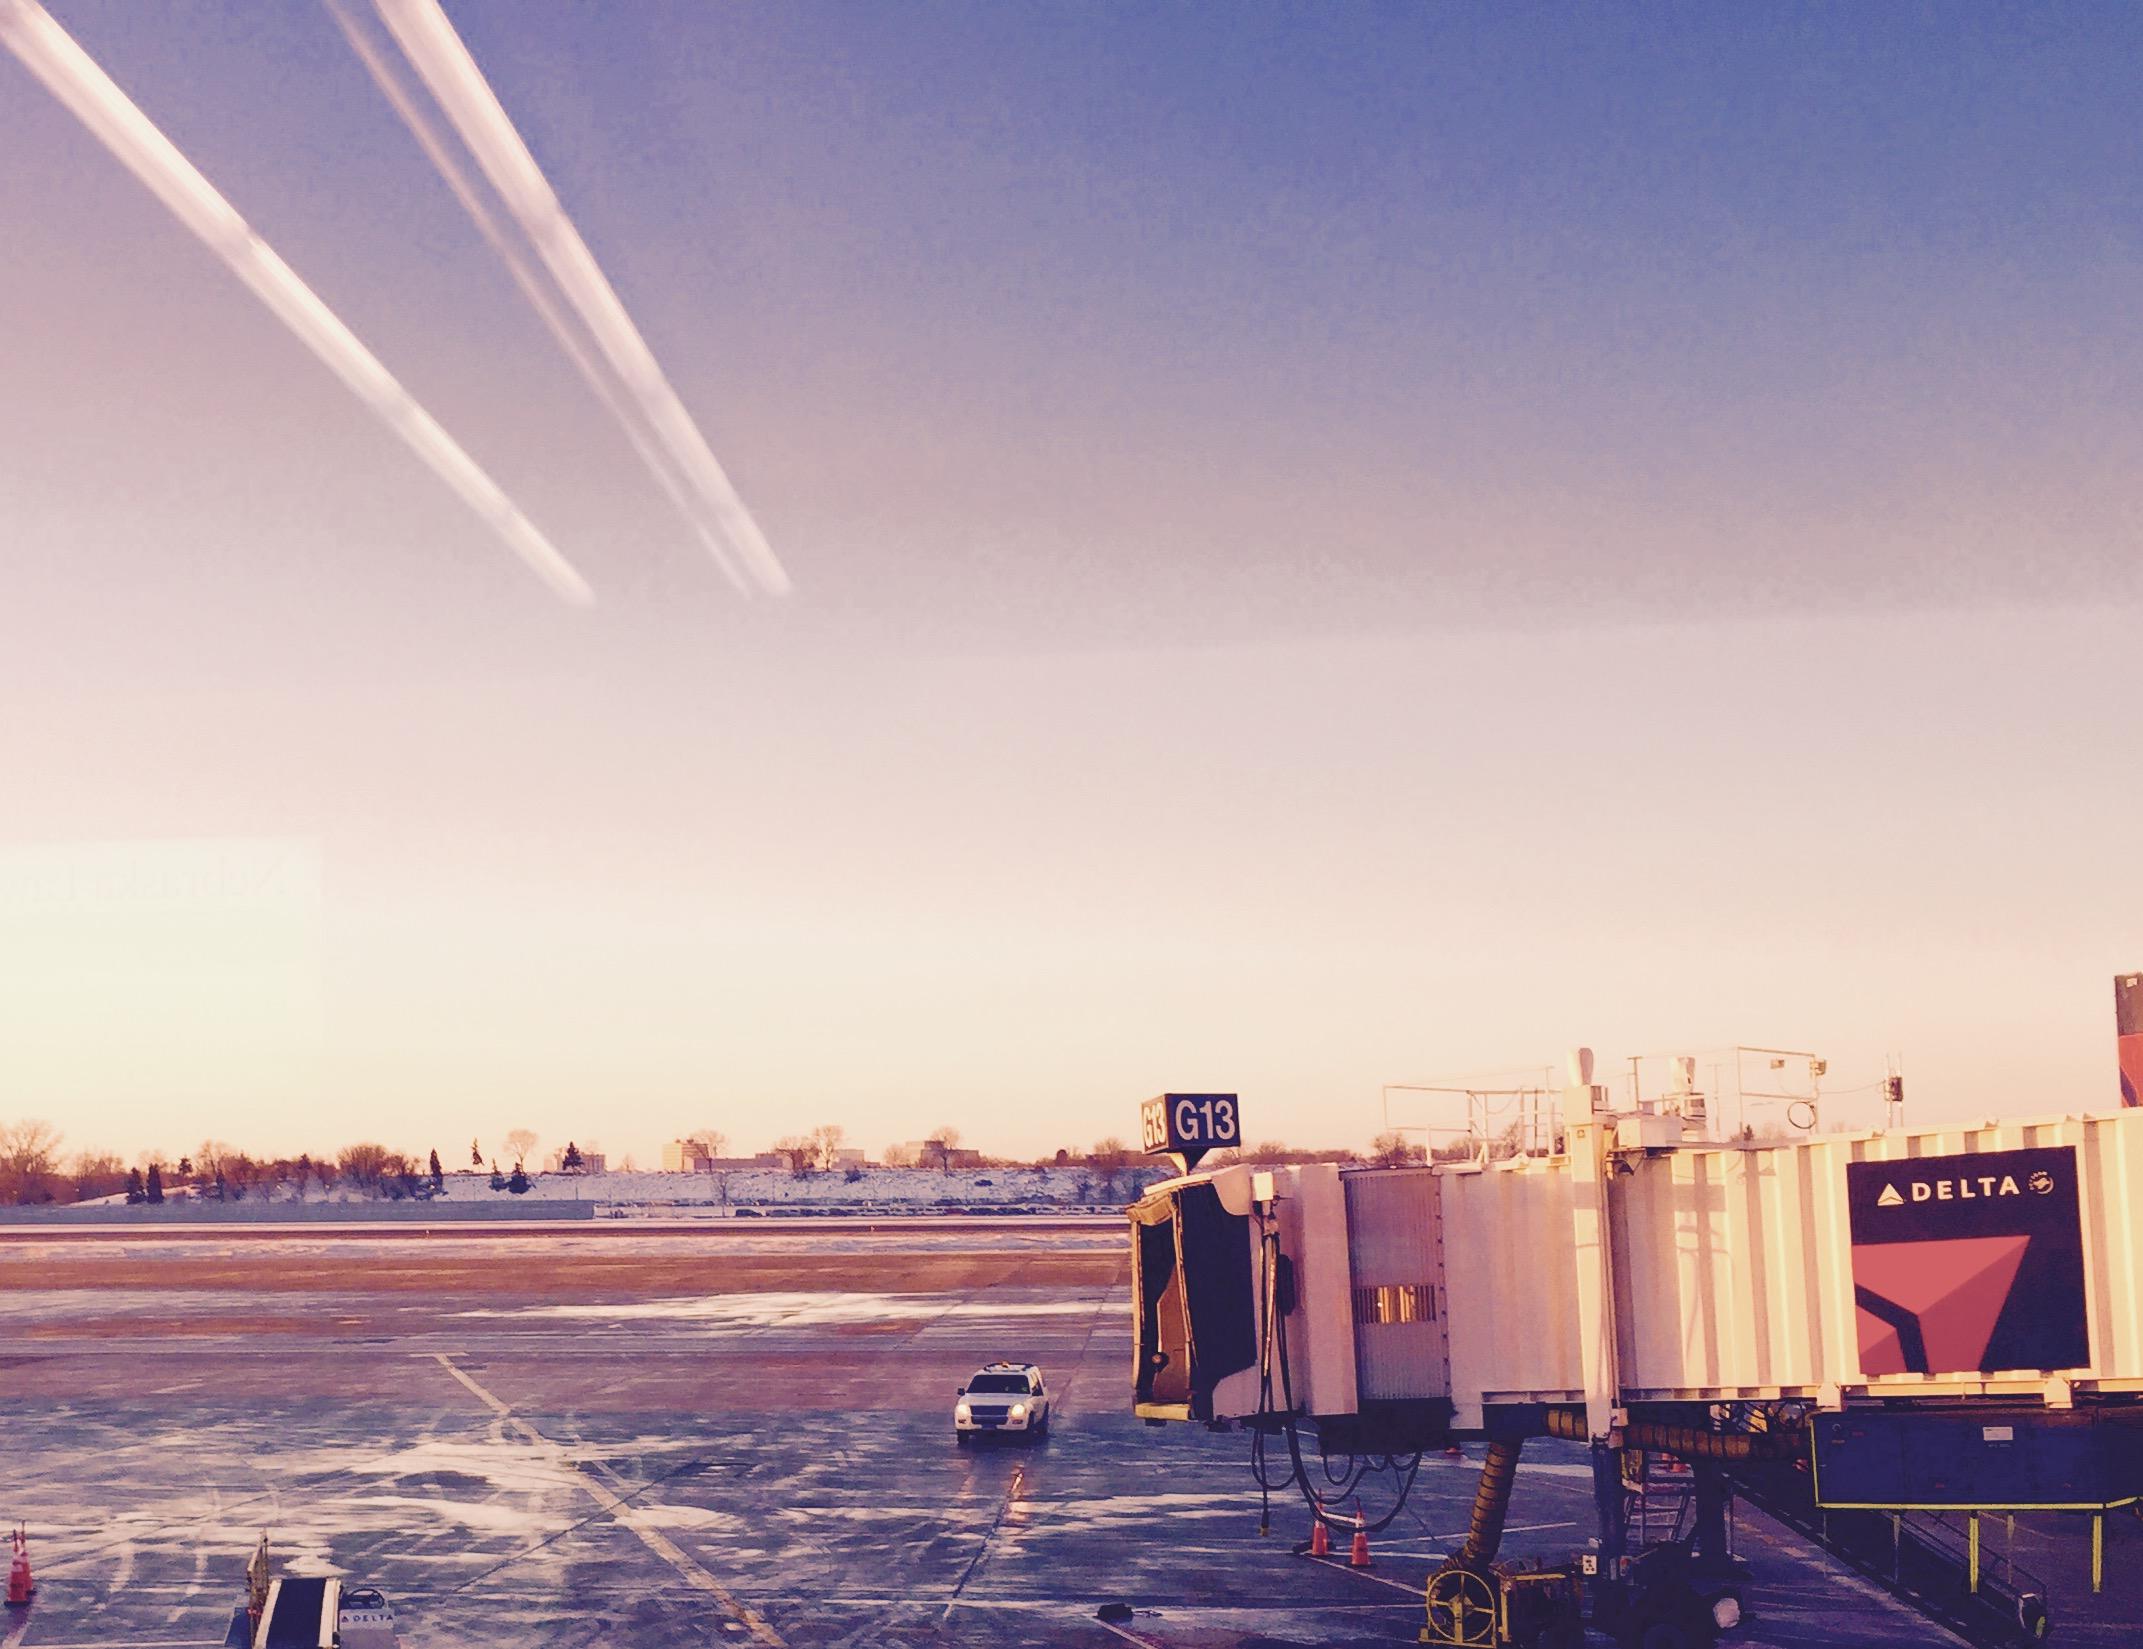 No plane here..